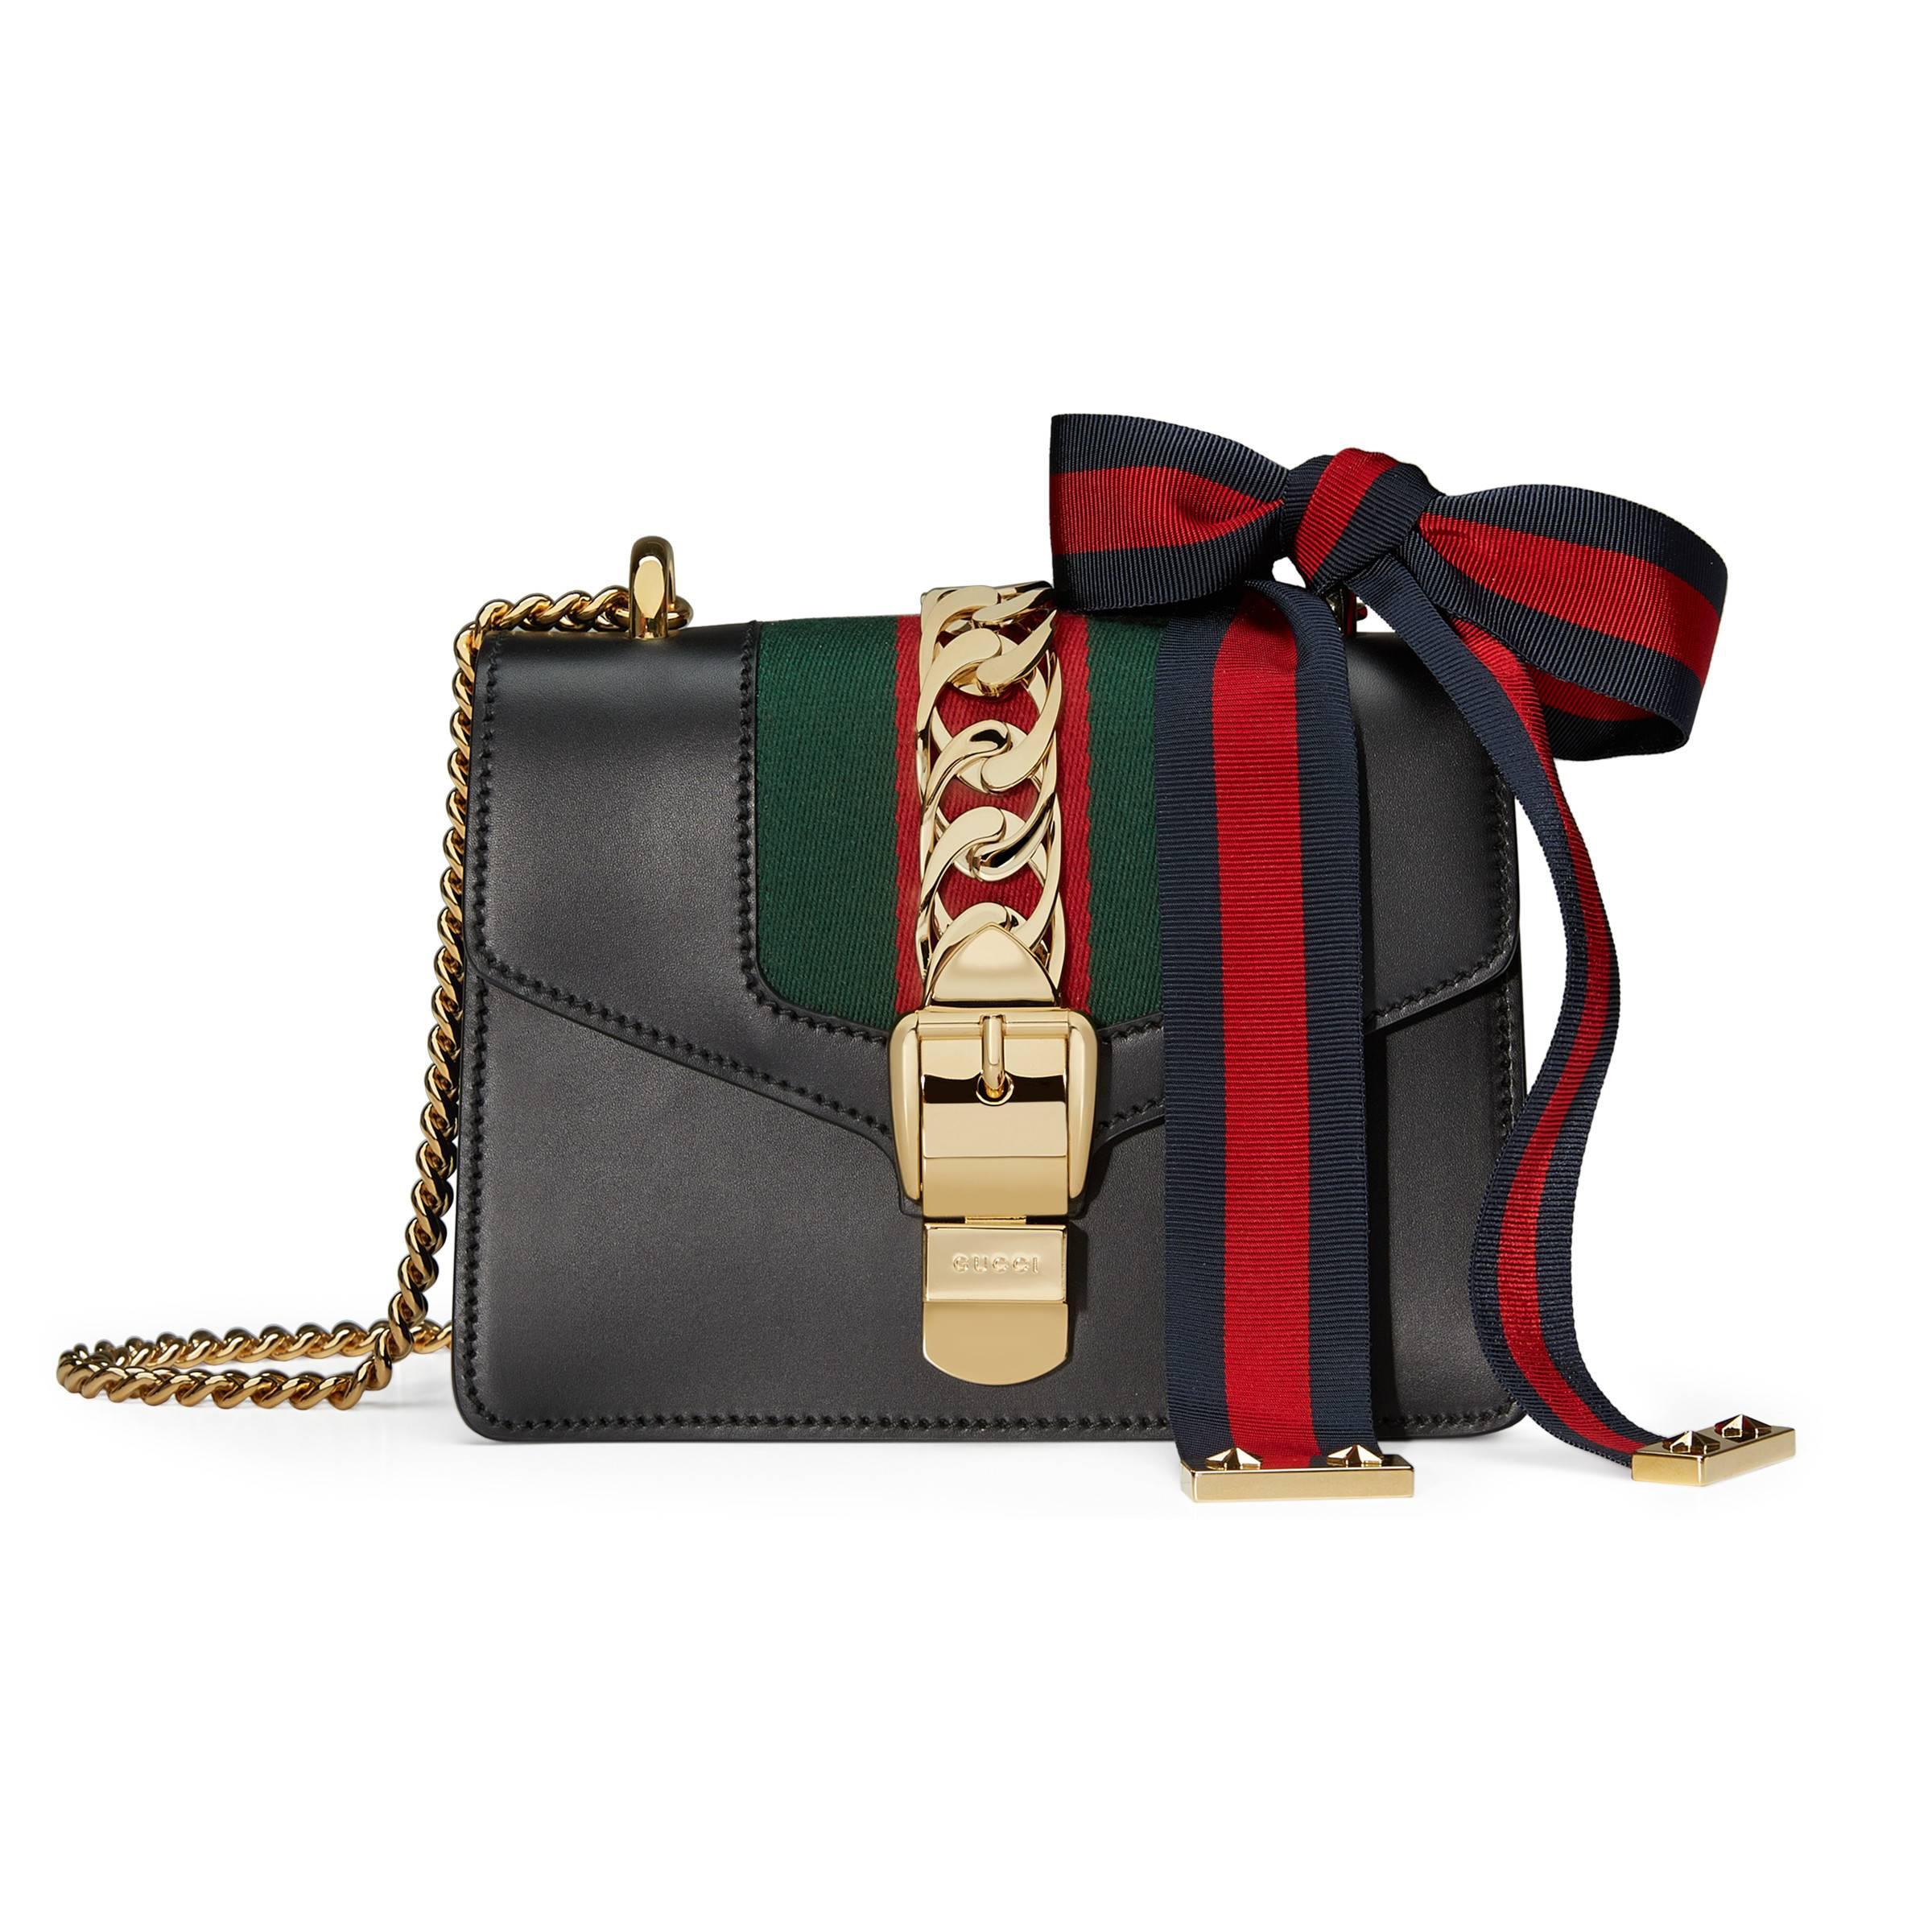 05409660d2fb Gucci - Black Sylvie Mini Chain Bag - Lyst. View fullscreen